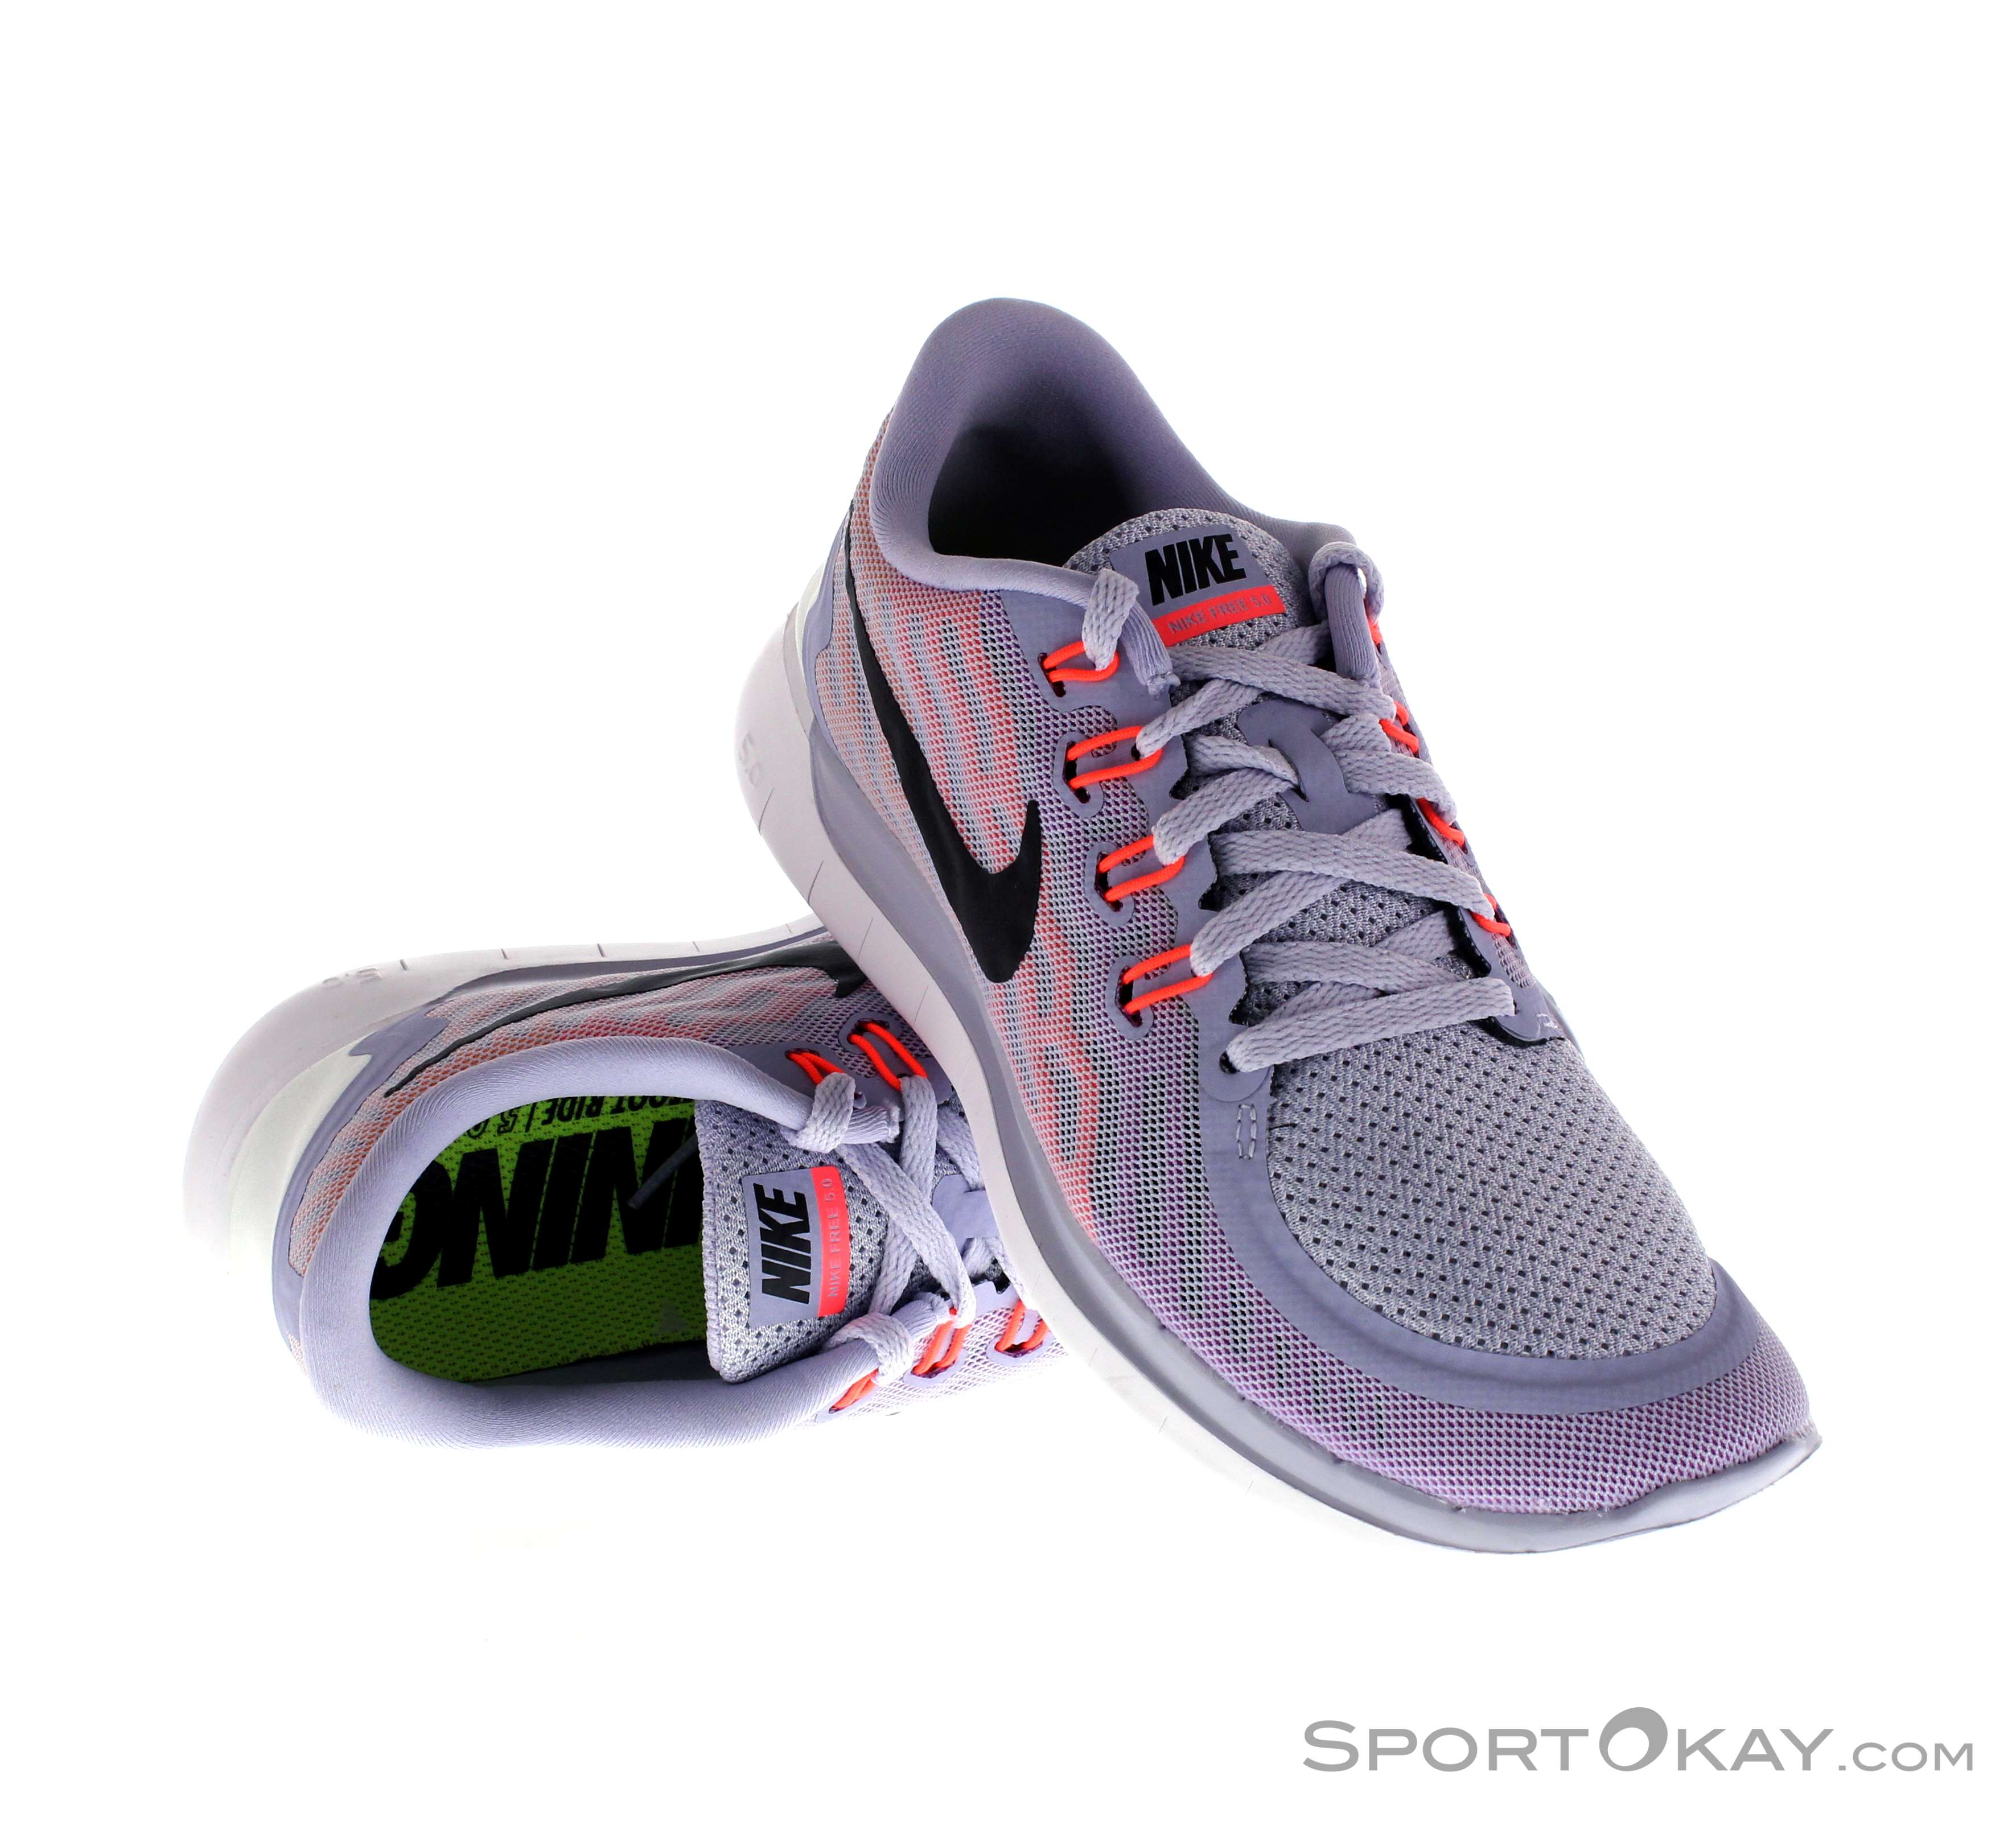 Nike Free 5.0 Damen Laufschuhe Allroundlaufschuhe